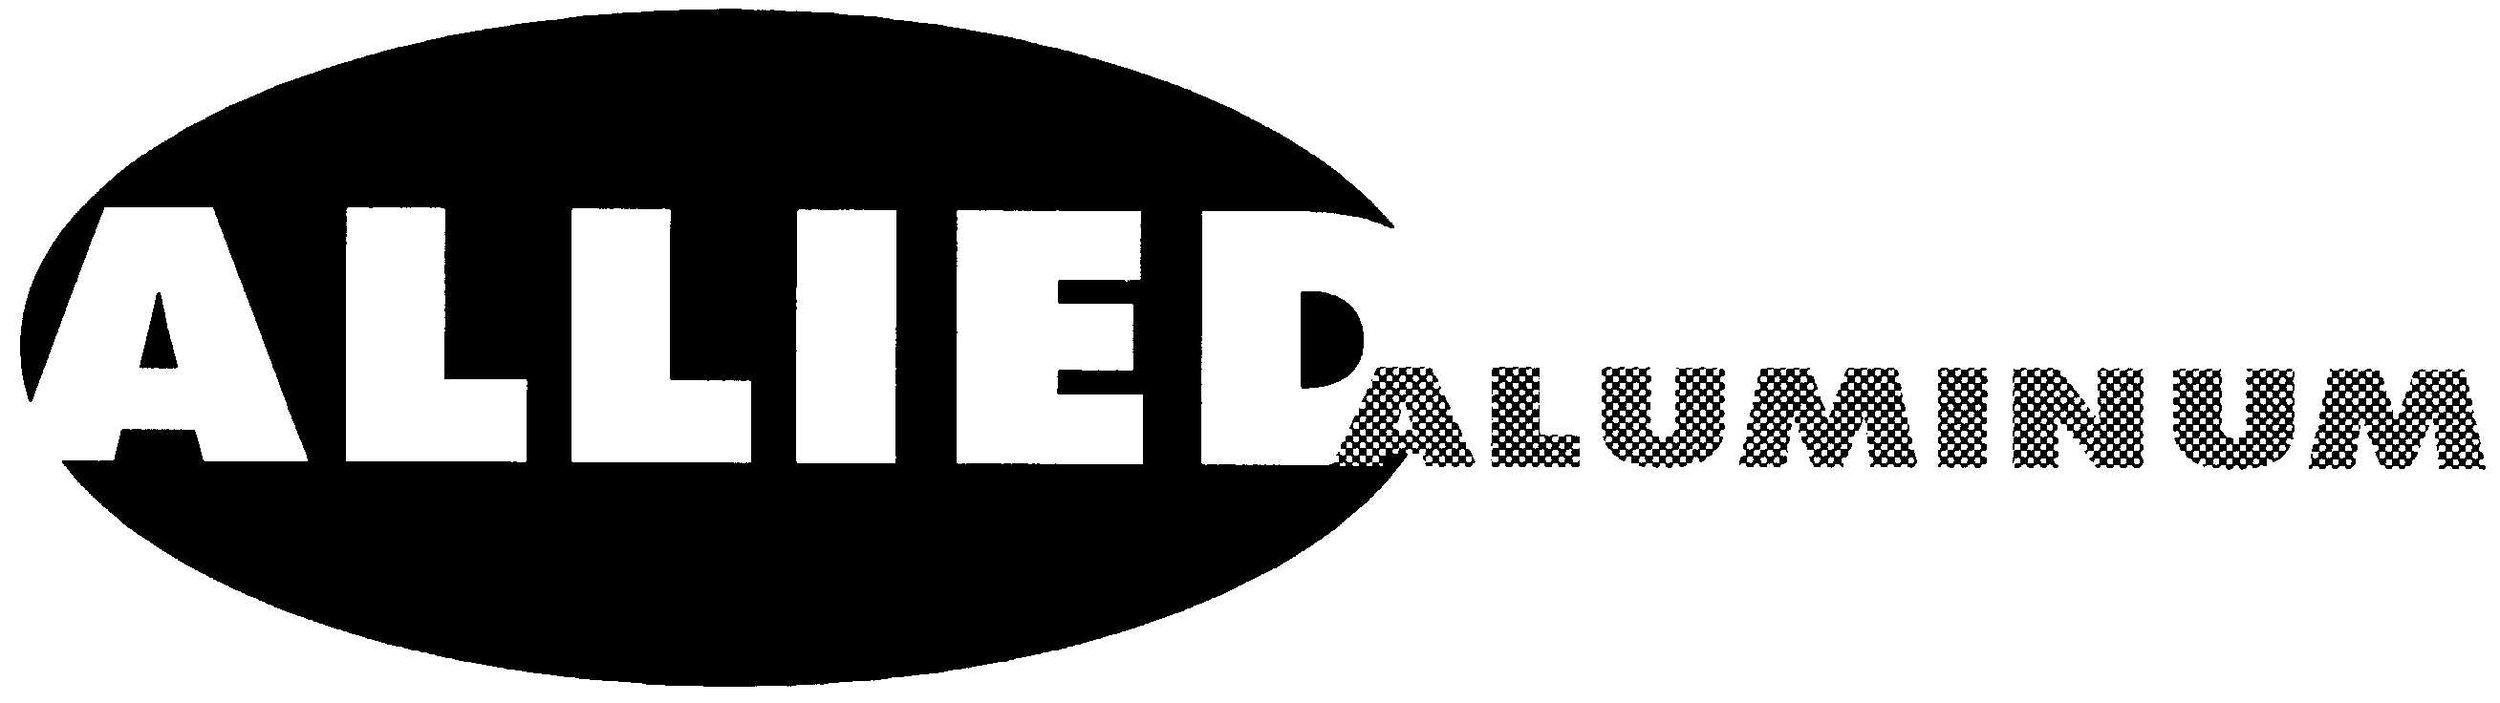 Allied Old Logo.jpg